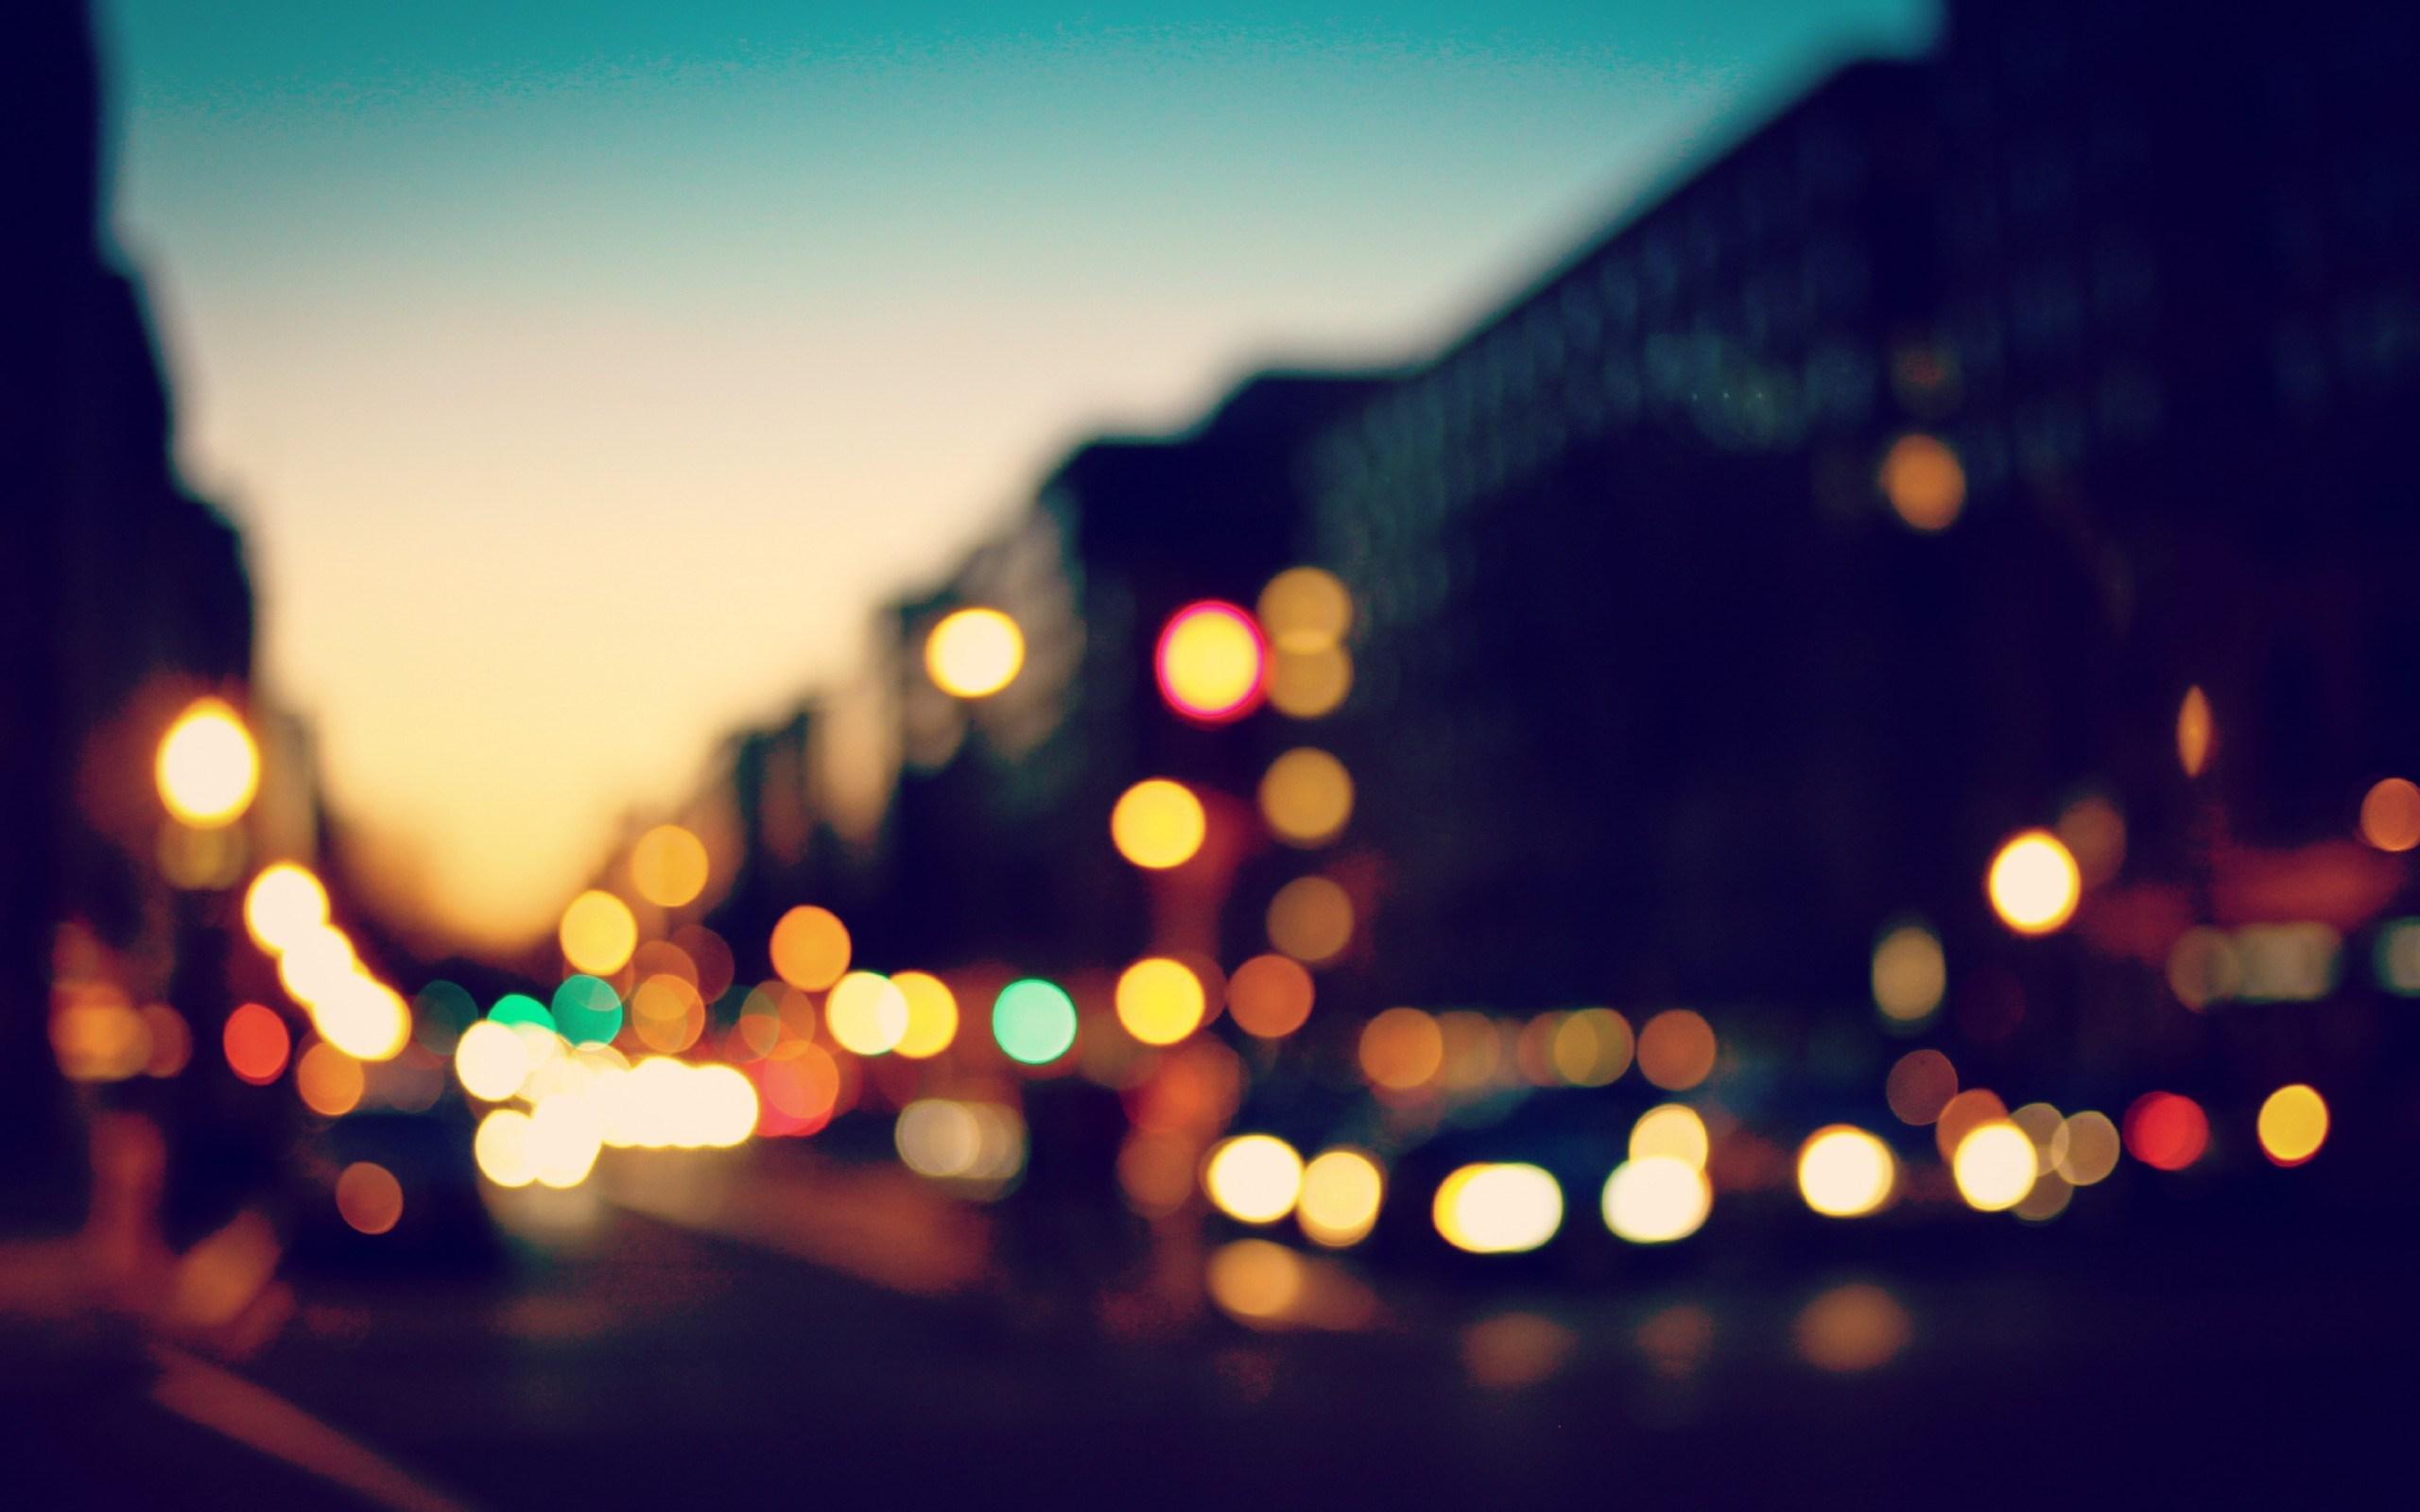 bokeh city lights photo fanciful evening hd wallpaper 2560x1600